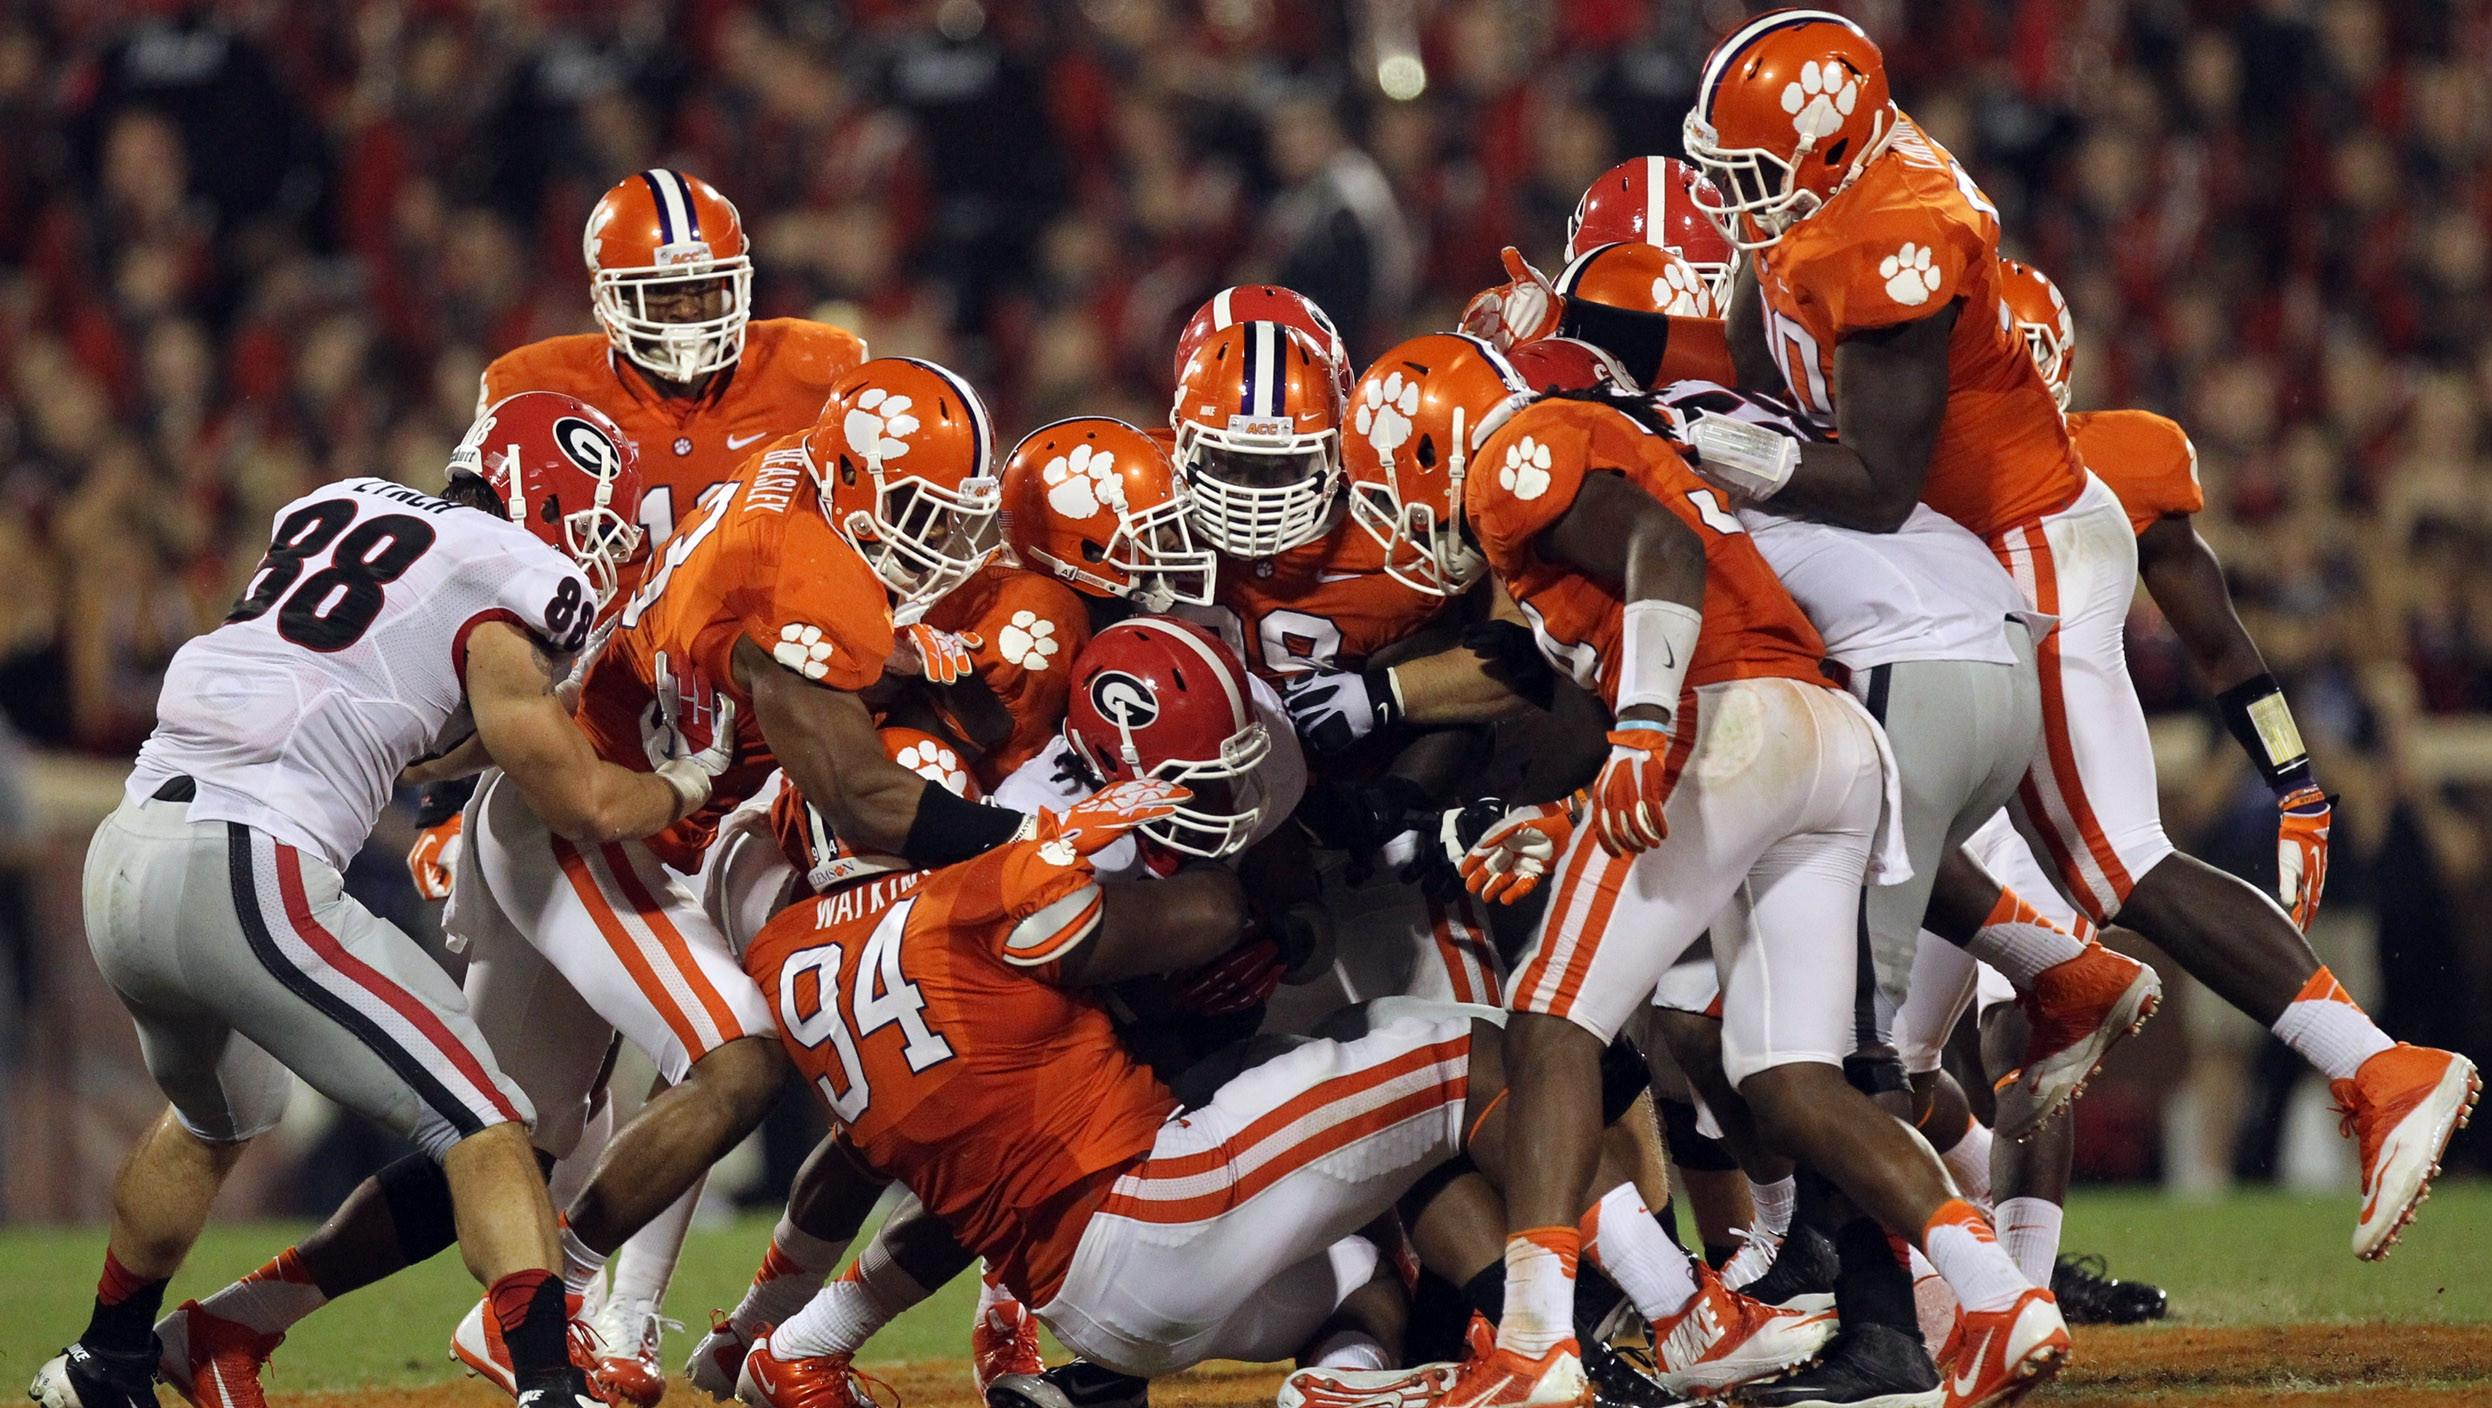 Orange Bowl Video Report: Dec. 19, Batson Mic'ed Up